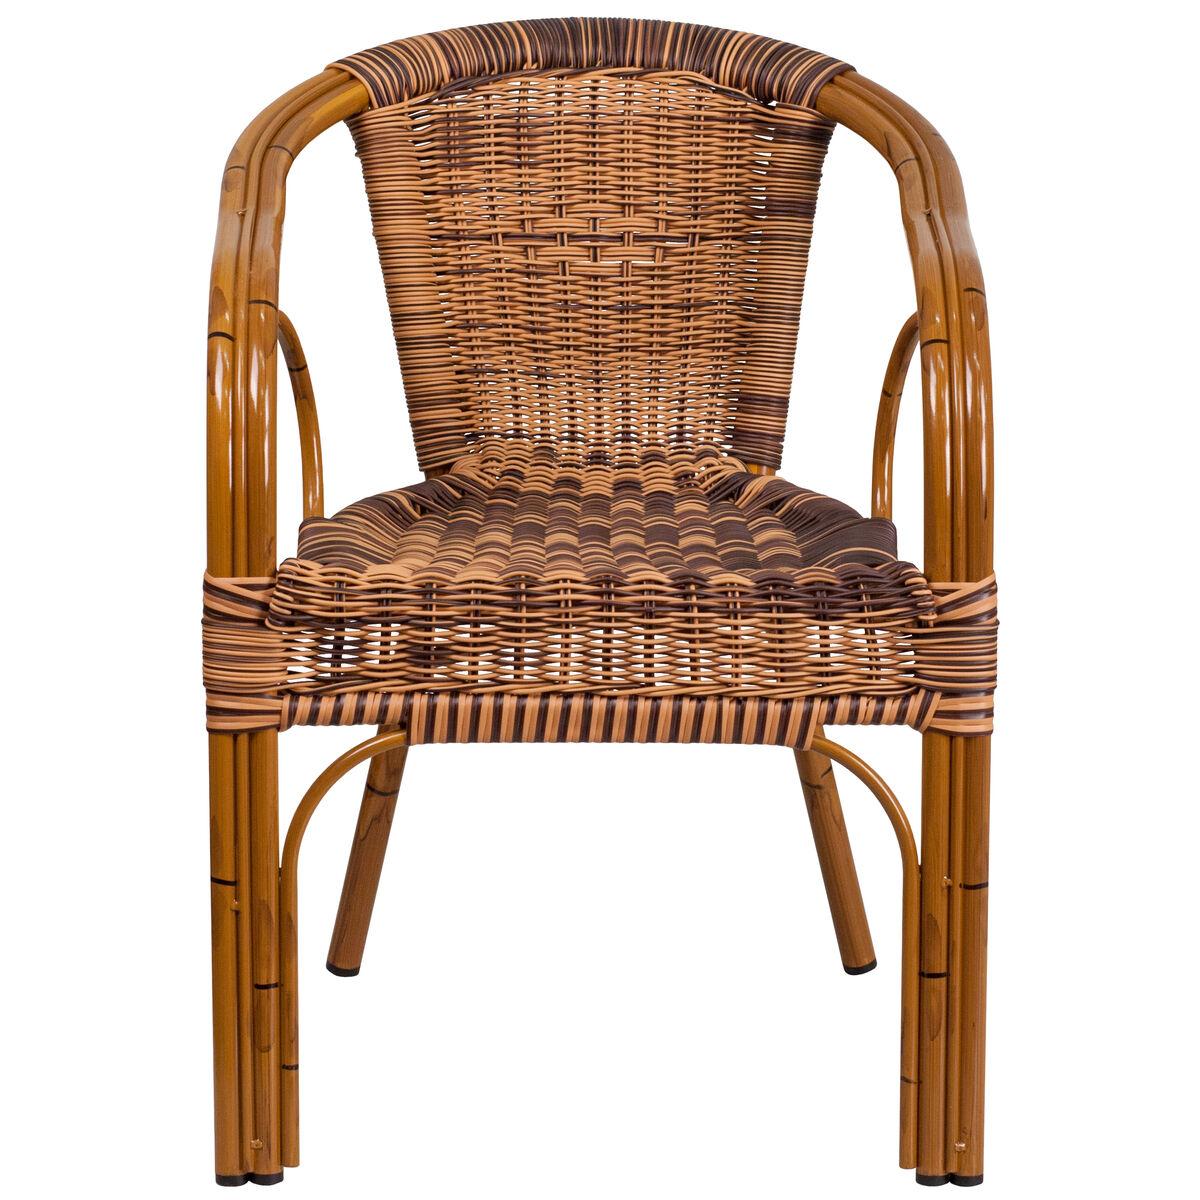 Rattan Chair Aluminum Frame Sda Ad632009d Stackchairs4less Com